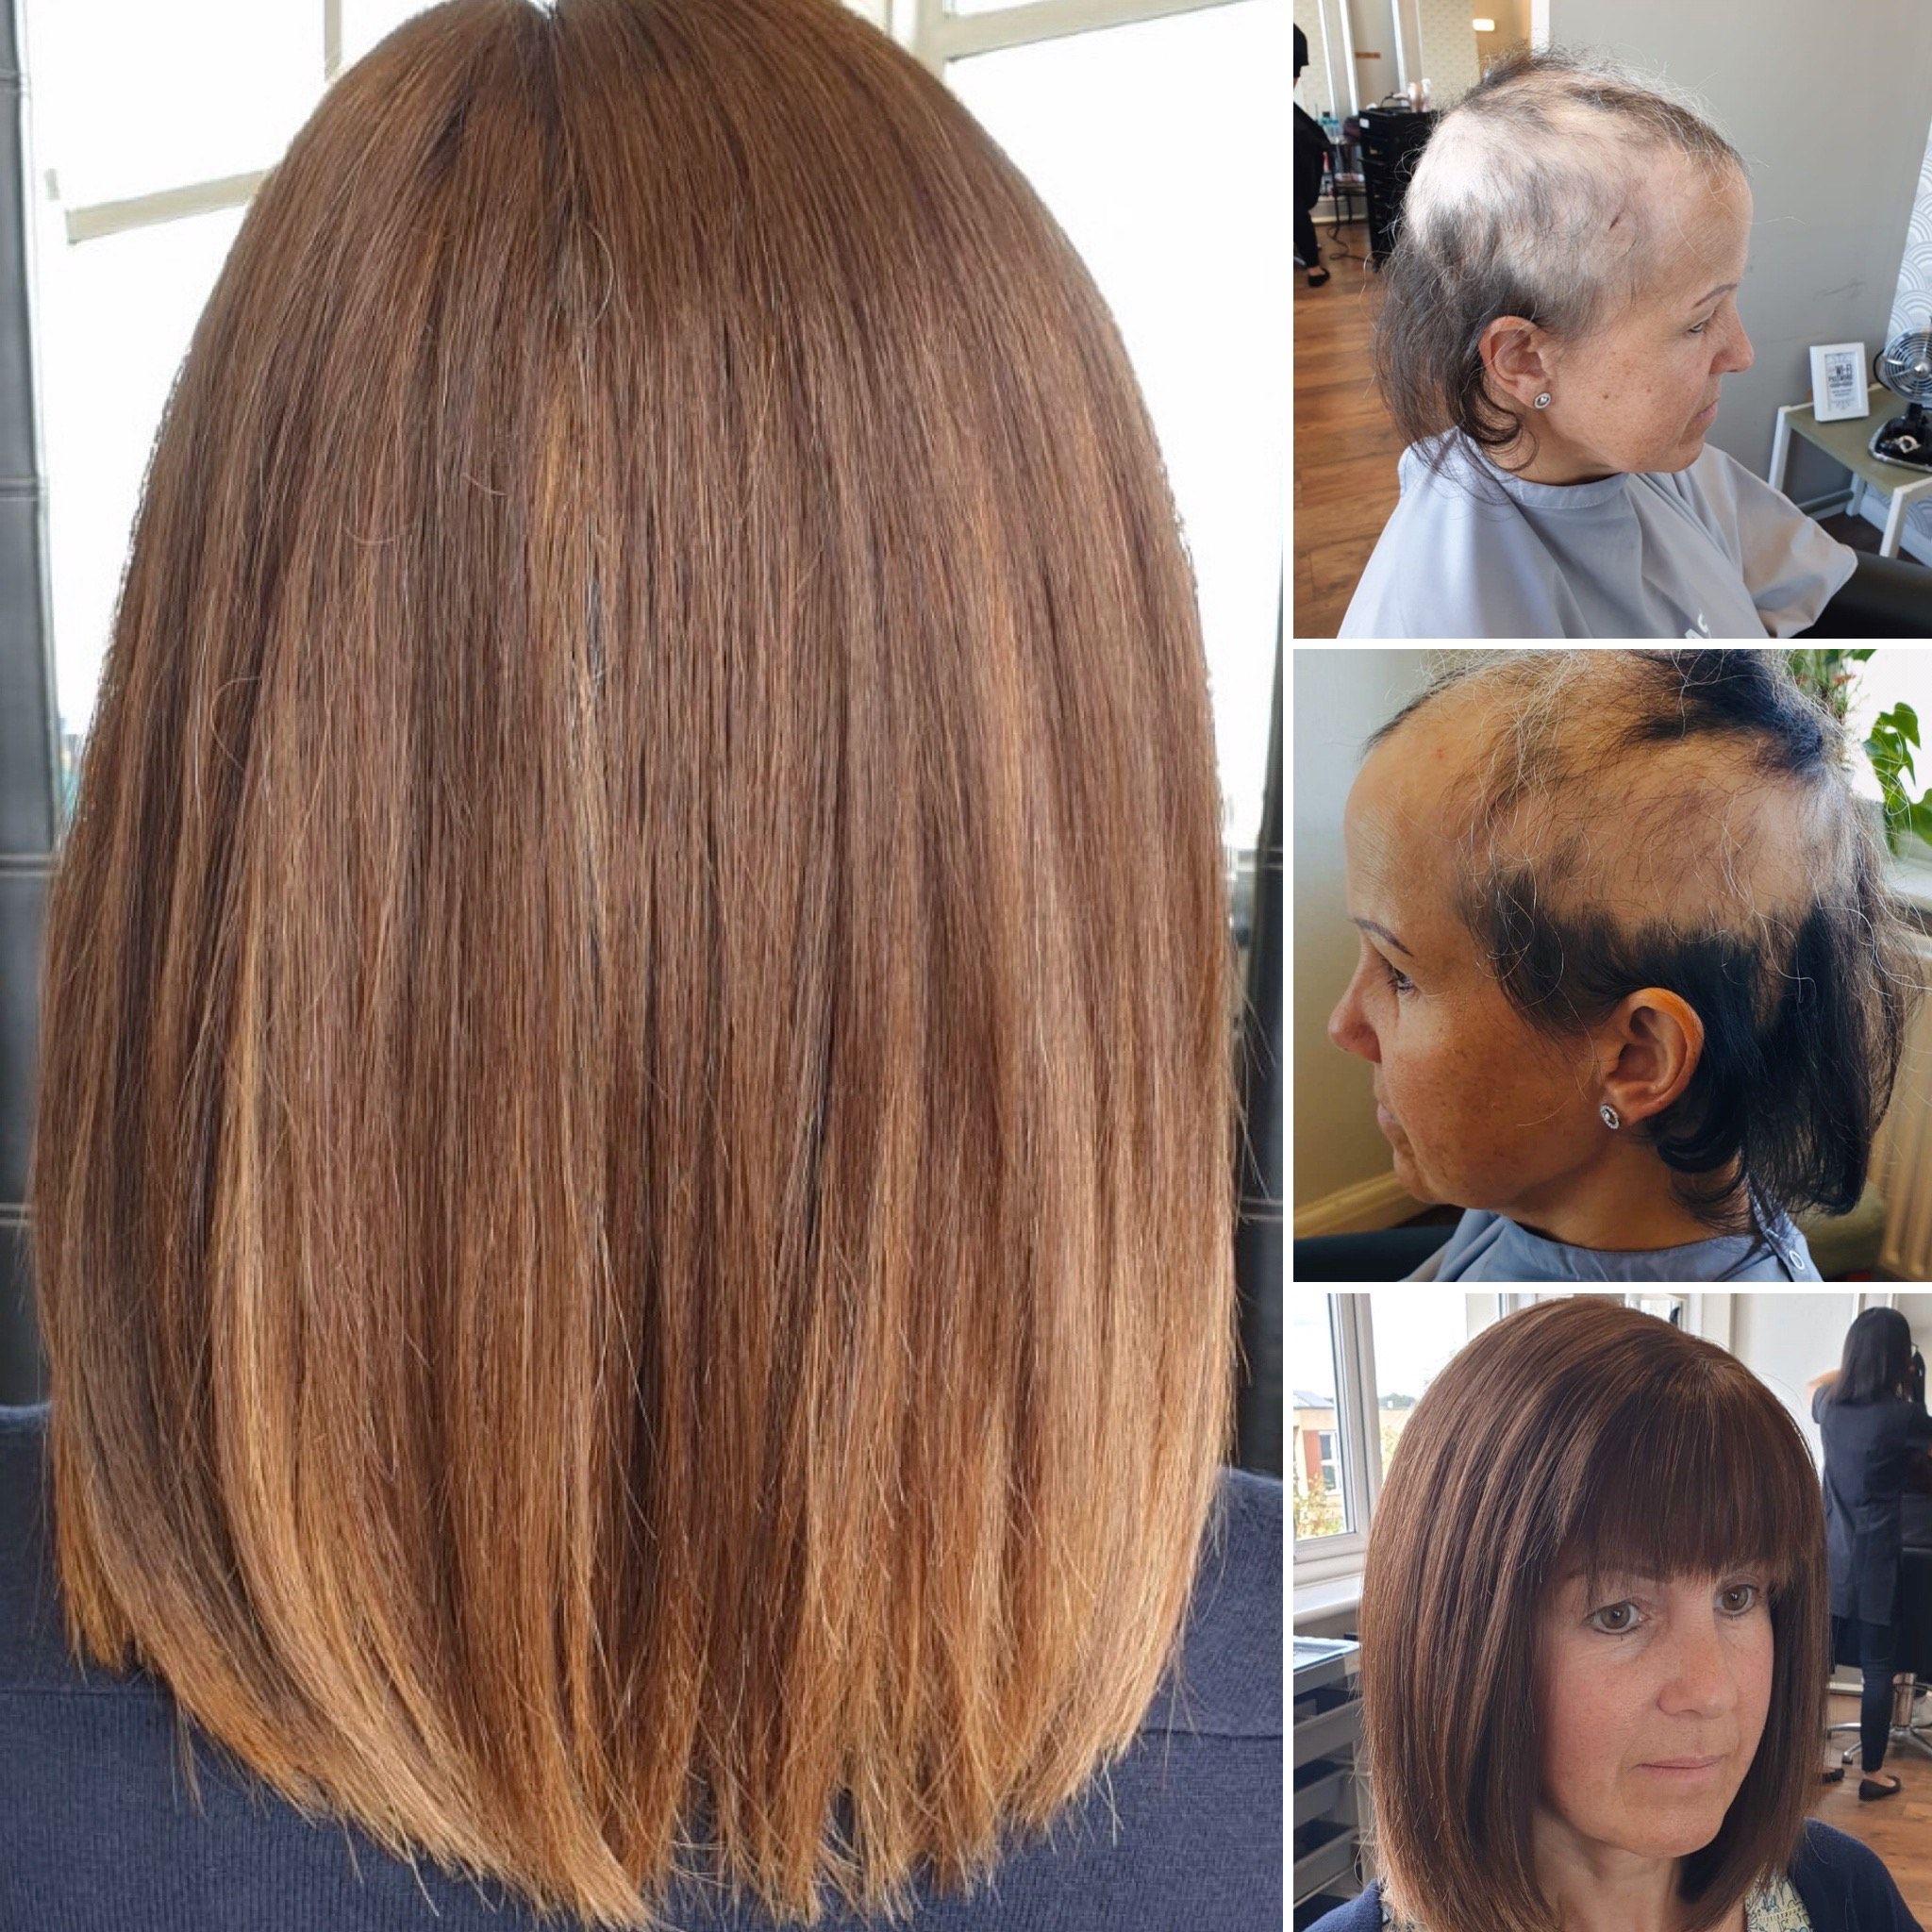 Hair Solved London Female Hair Loss Thinning Hair Specialists In 2020 Hair Loss Wigs Thinning Hair Loss Mens Hair Loss Treatment